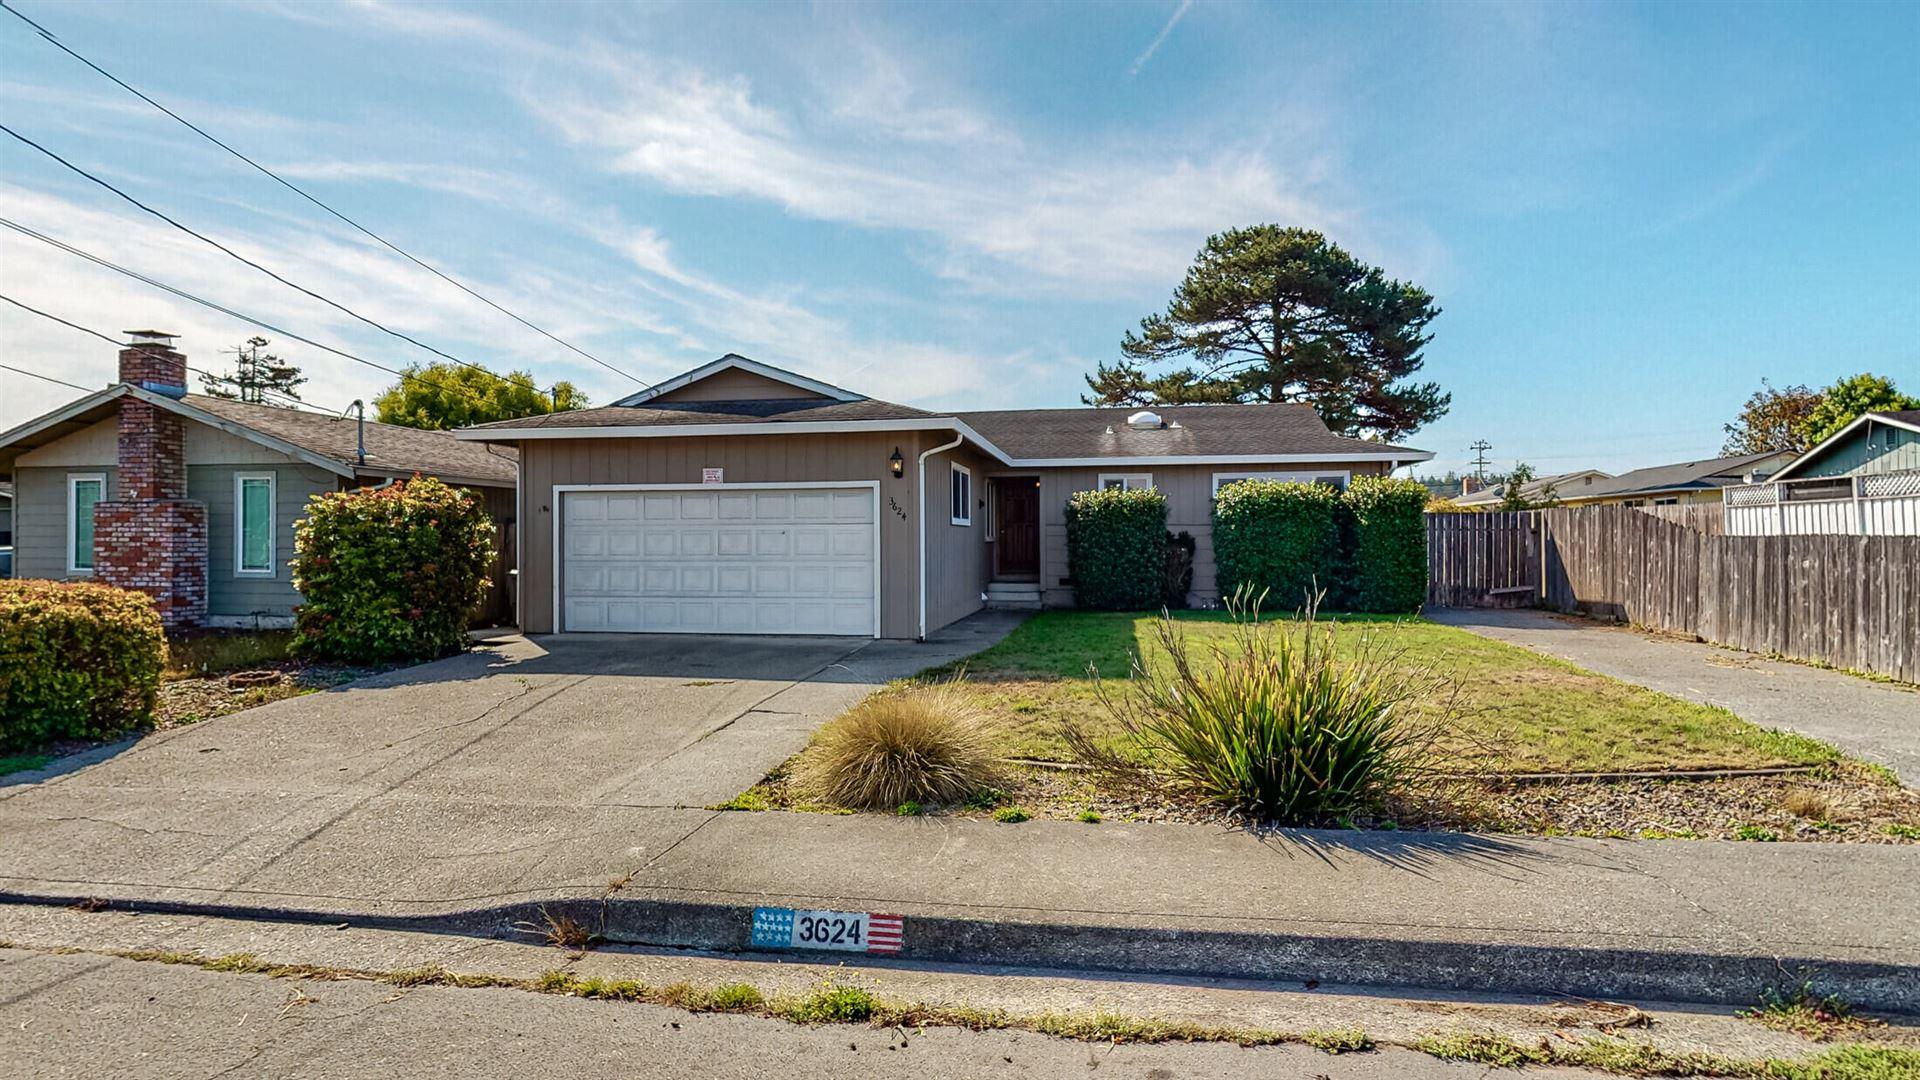 3624 Glenwood Street, Eureka, CA 95501 - MLS#: 260192